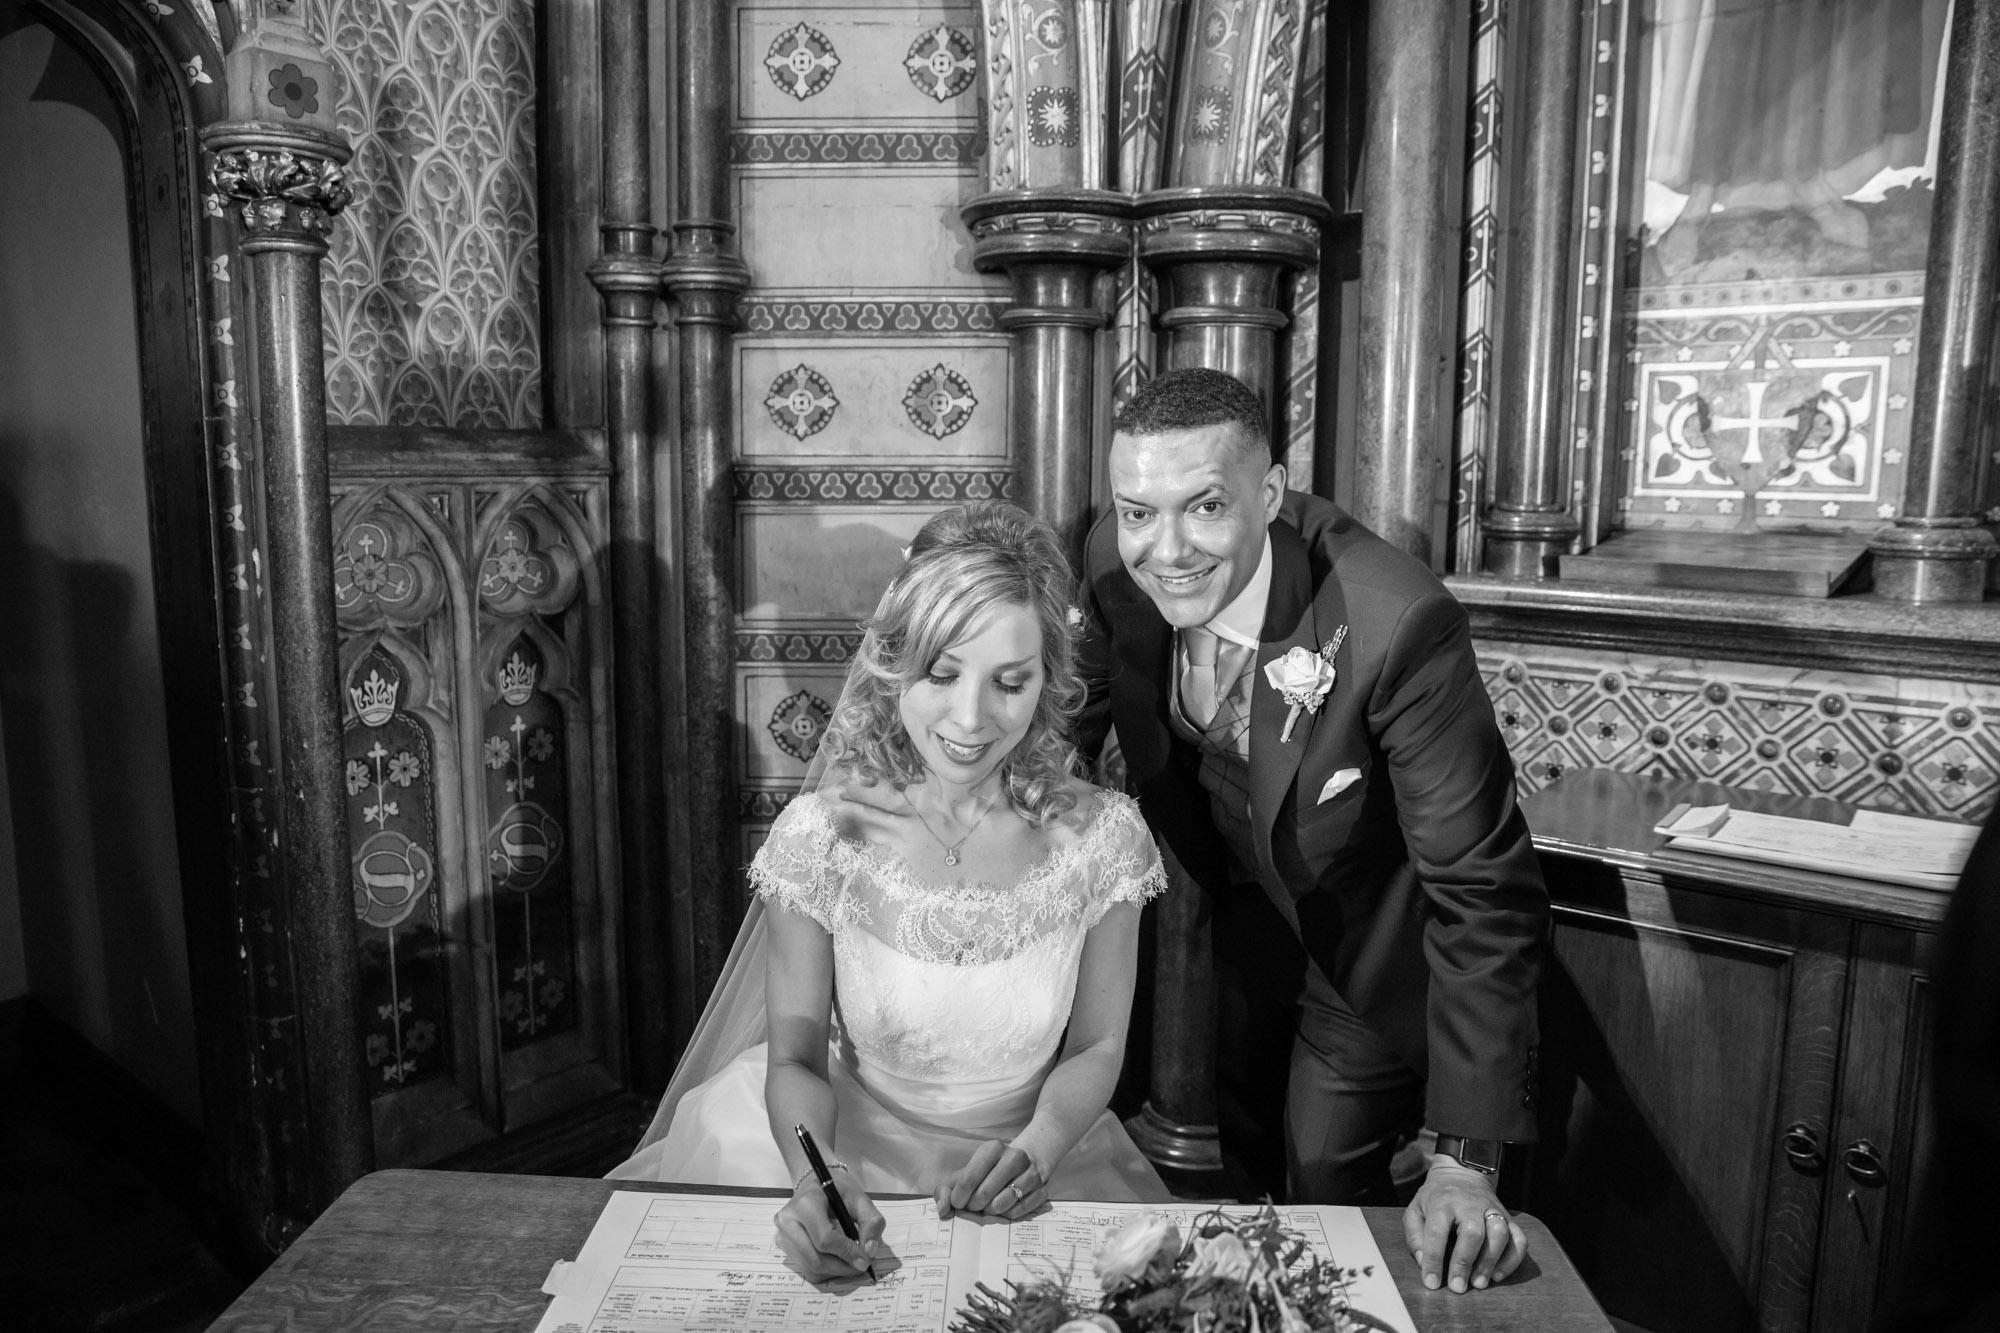 weddings-couples-love-photographer-oxford-london-jonathan-self-photography-40.jpg